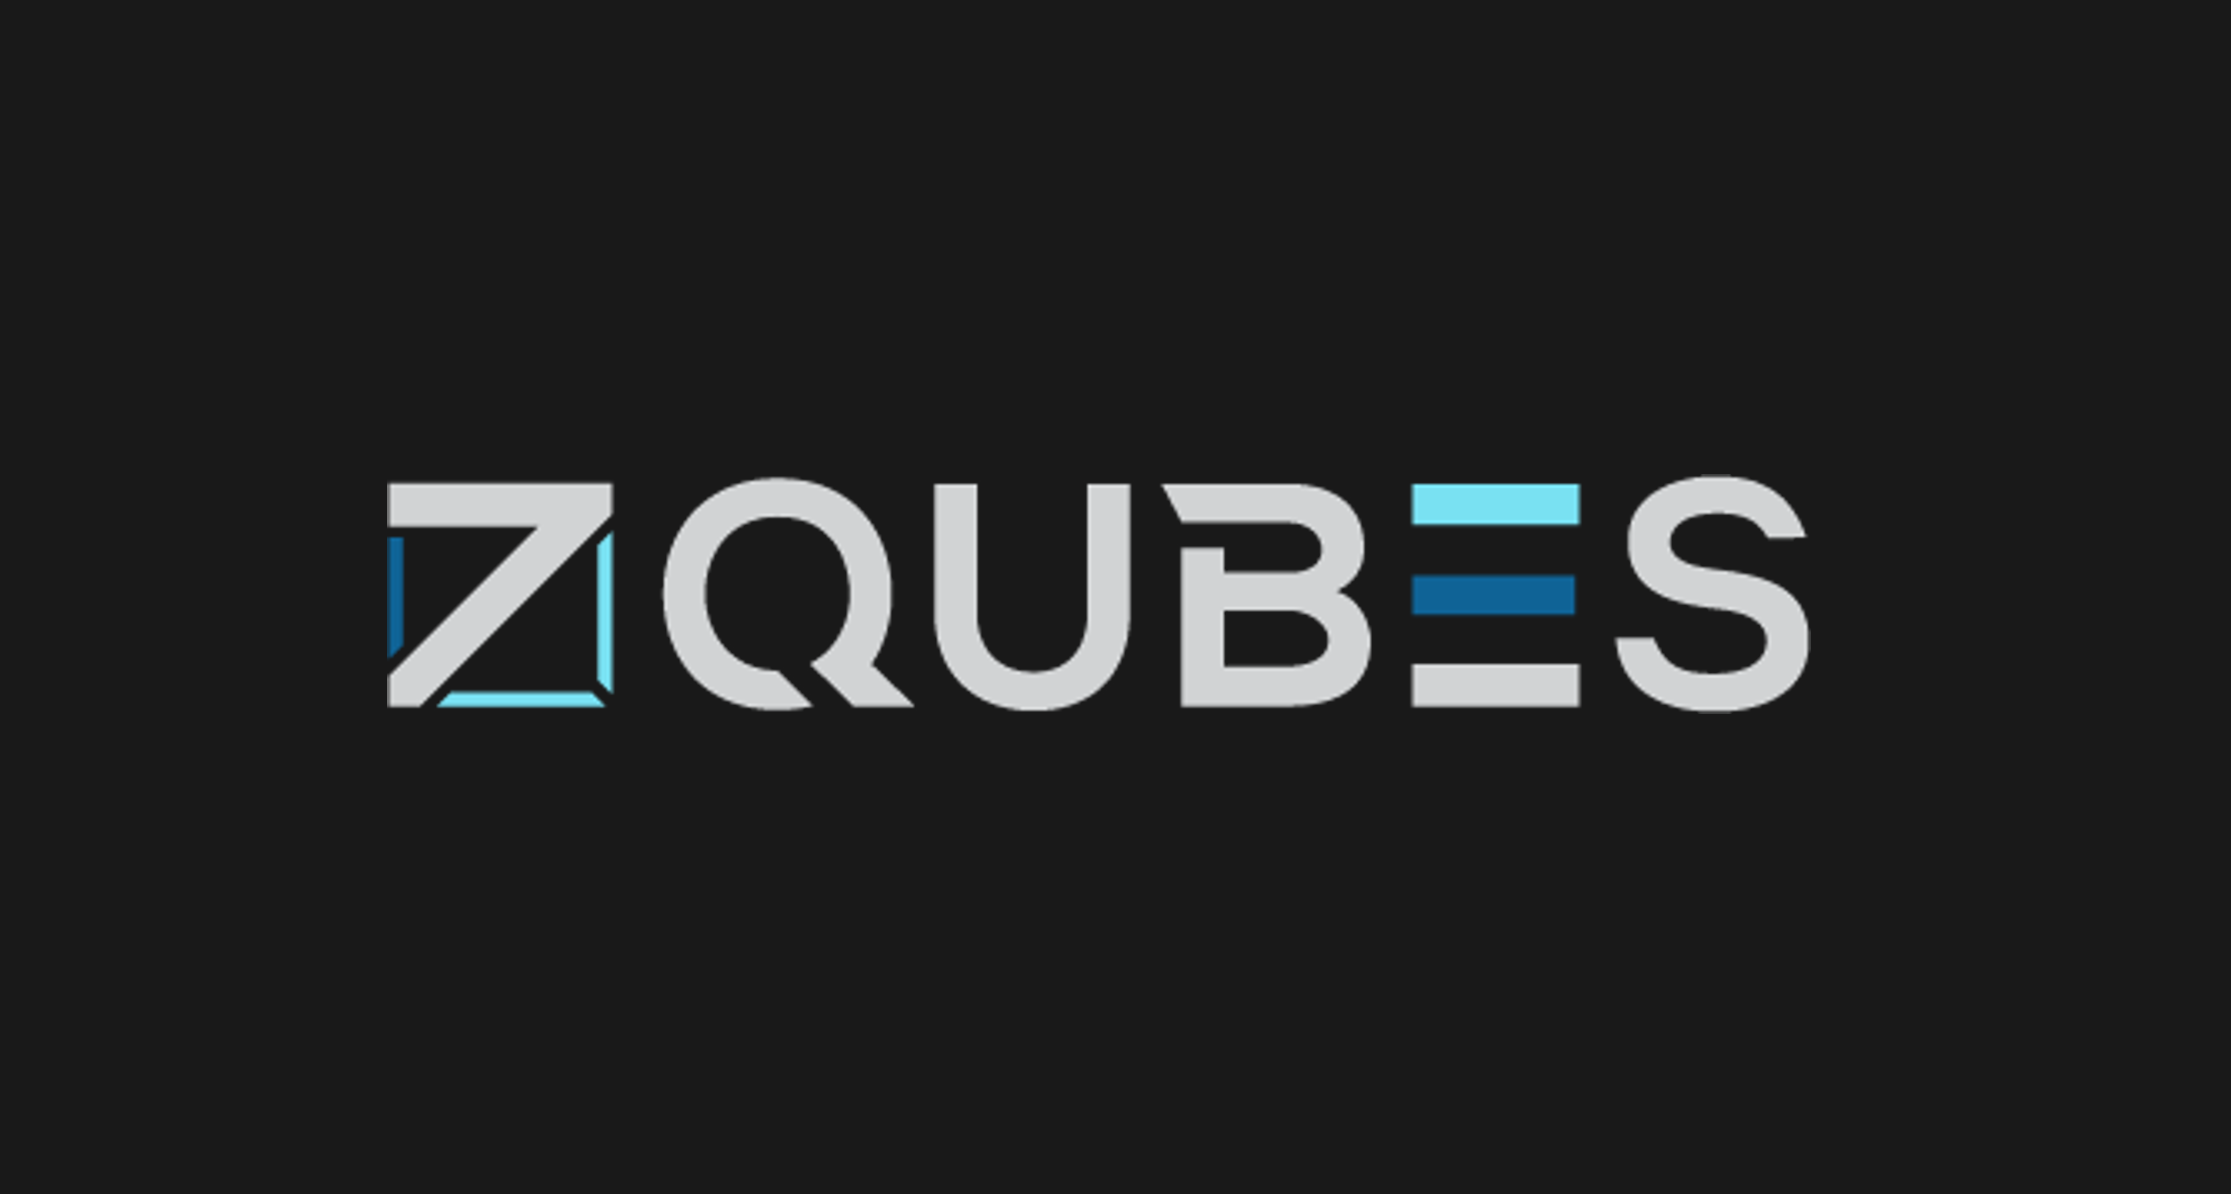 7QUBES LLC